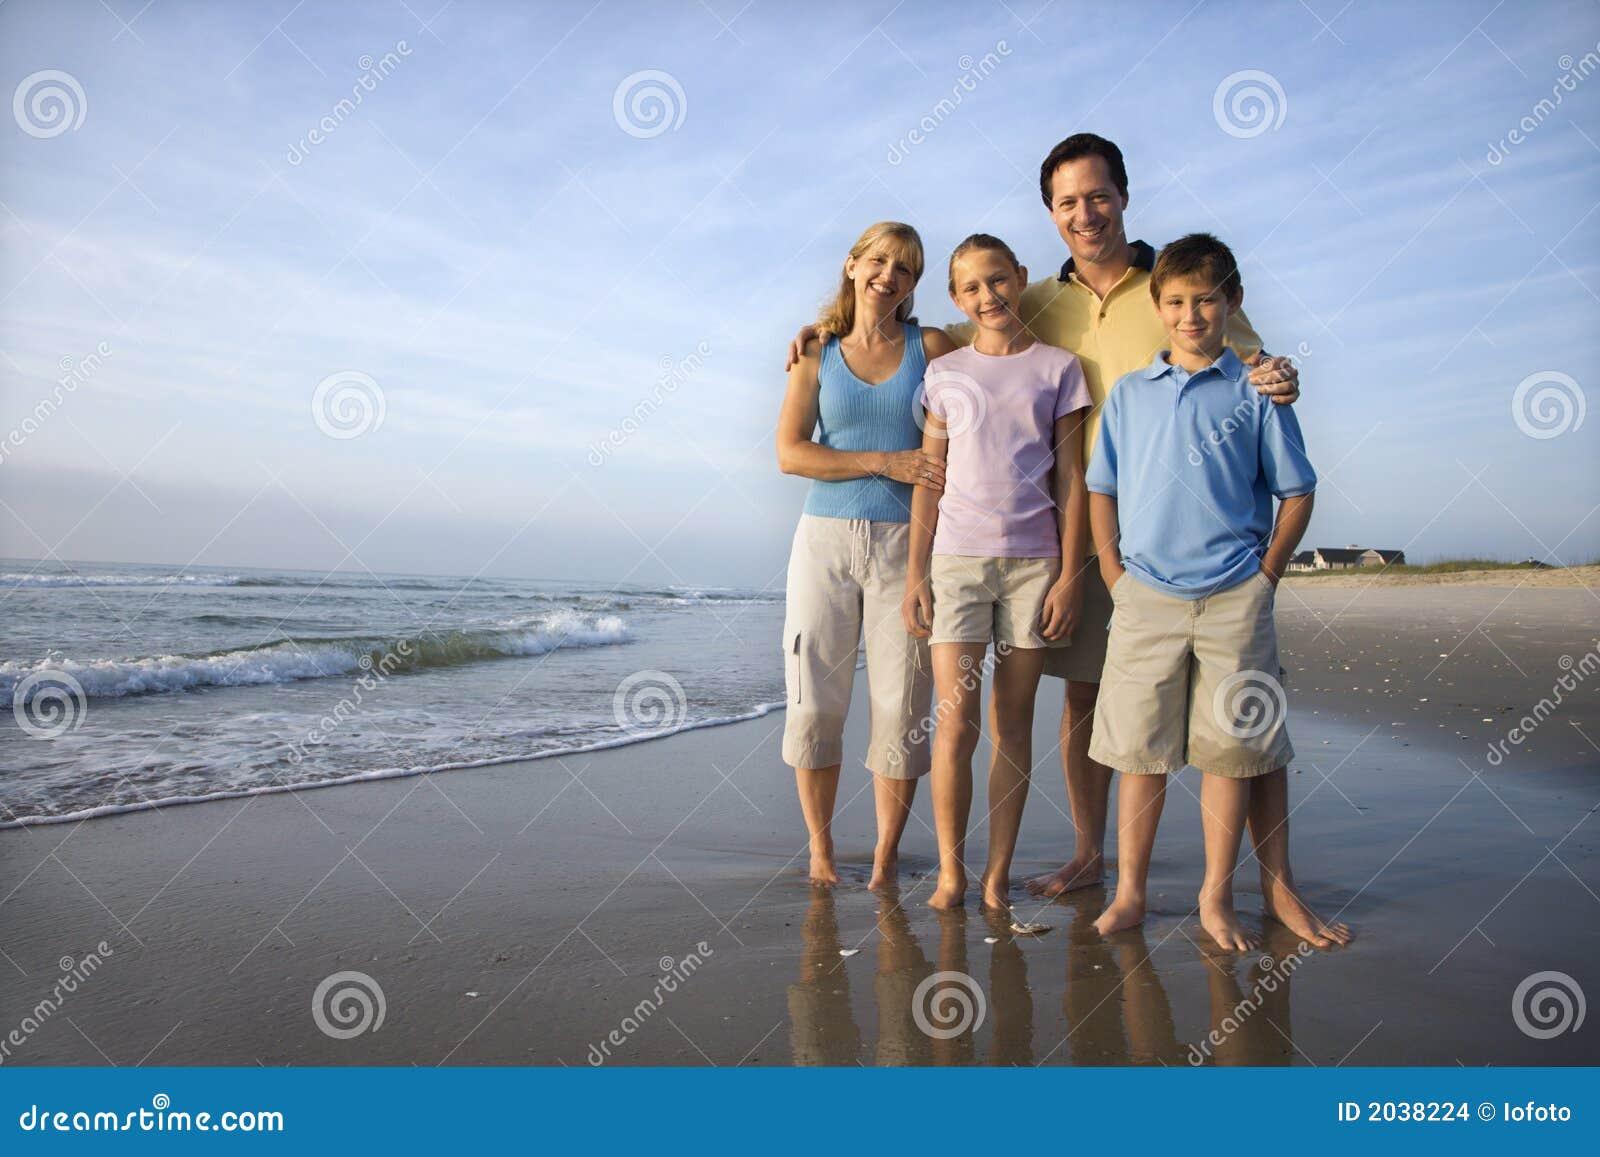 Familia sonriente en la playa.